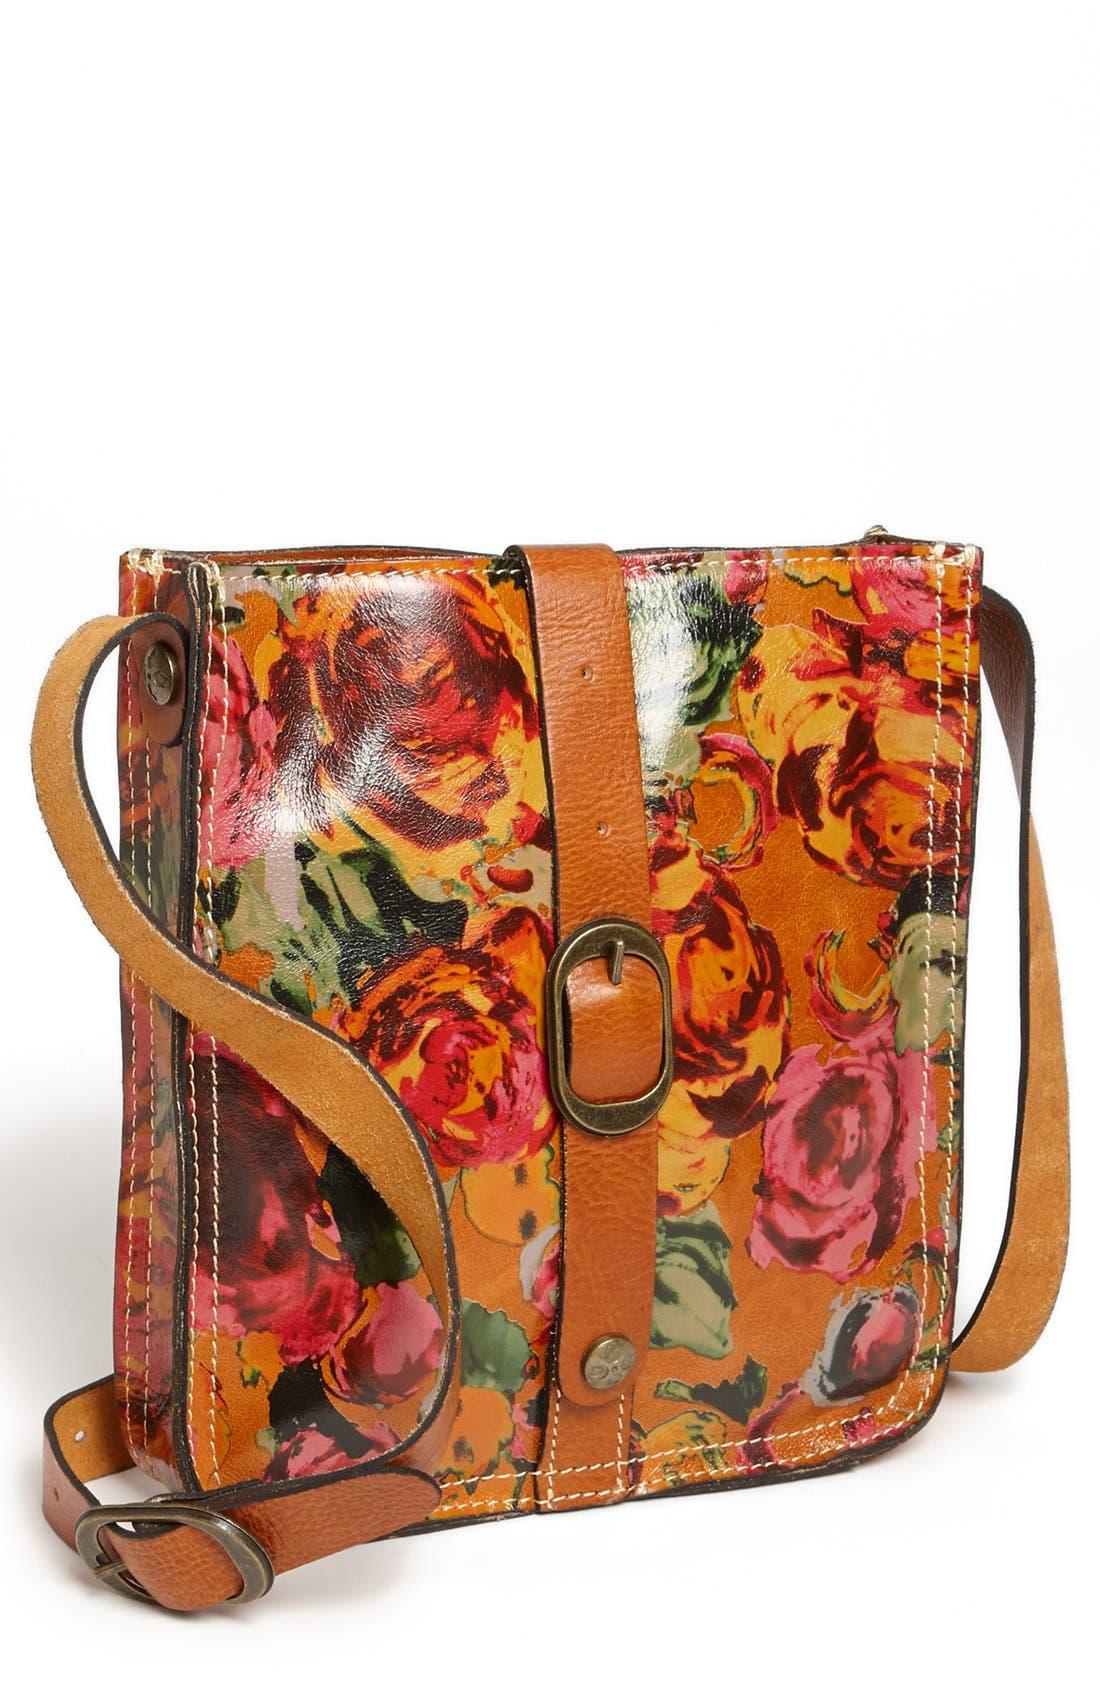 Alternate Image 1 Selected - Patricia Nash 'Venezia' Crossbody Bag